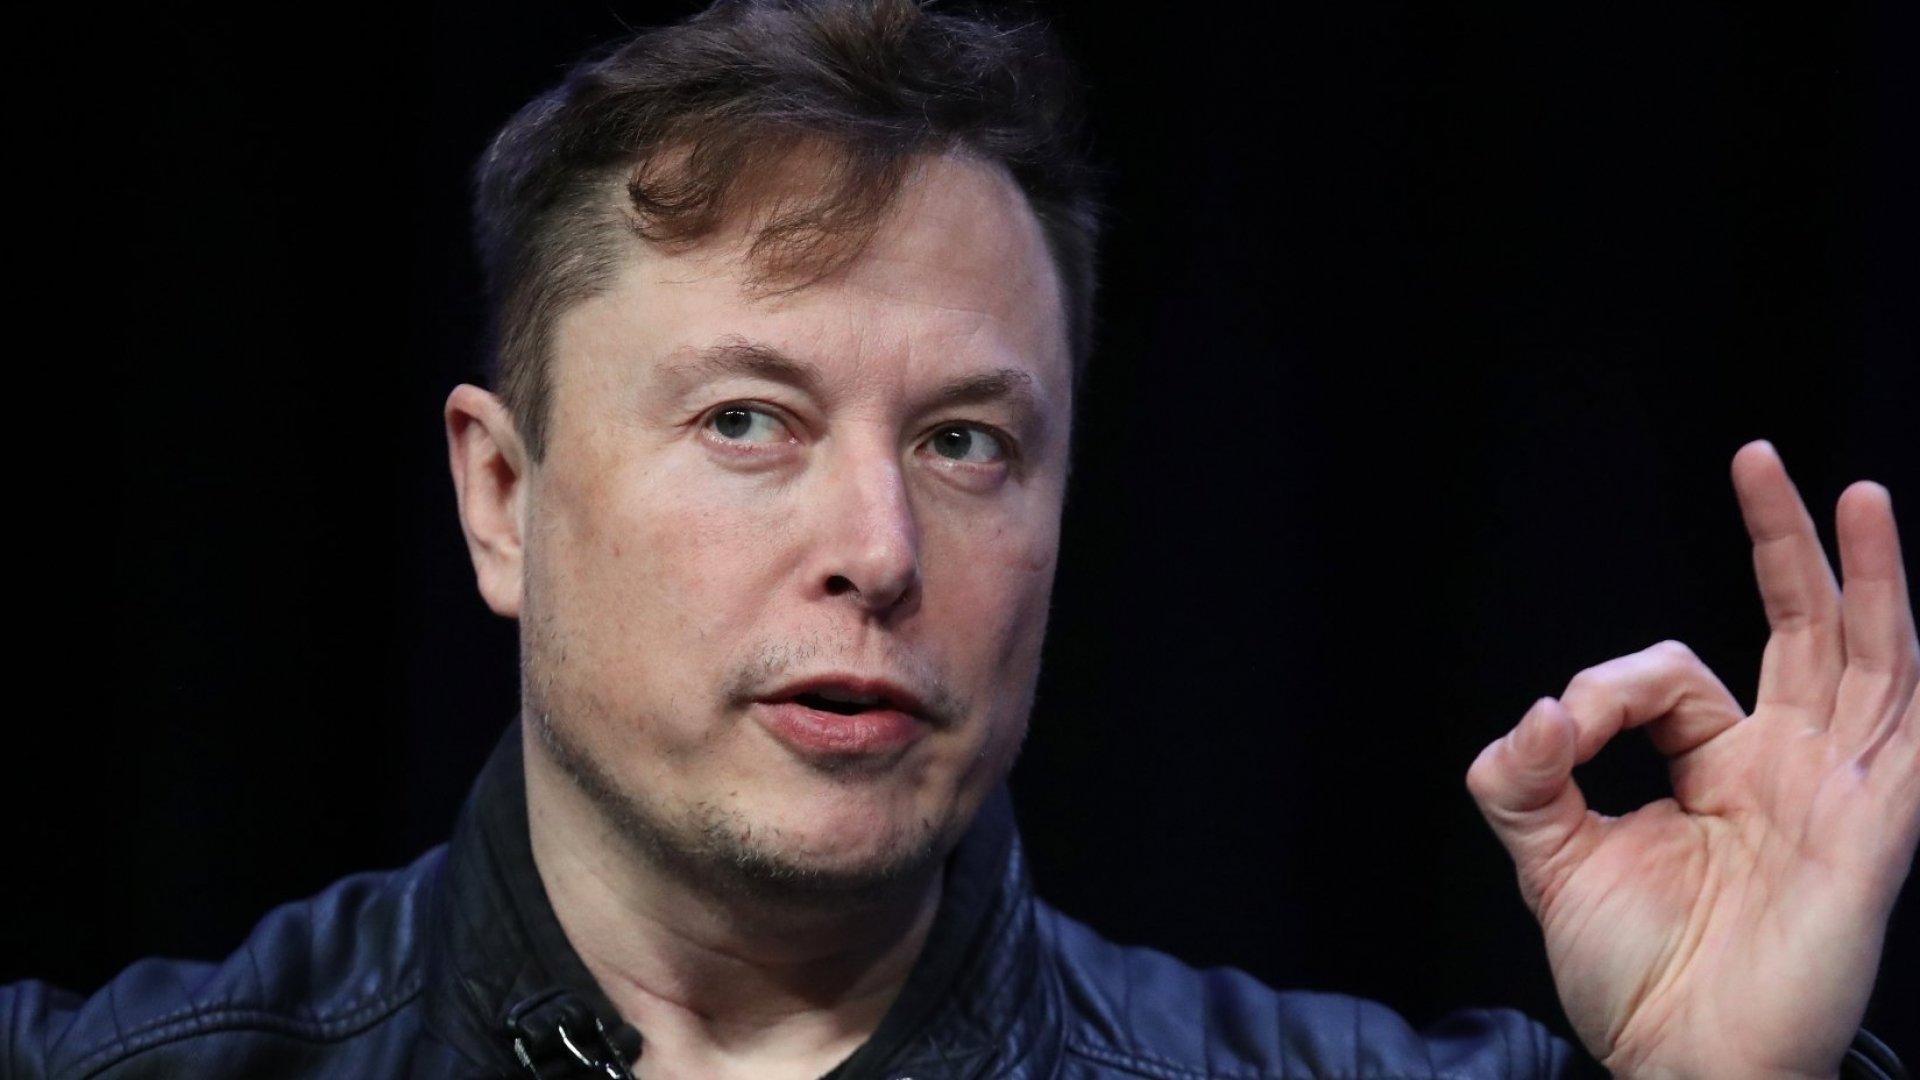 Elon Musk Says Tesla Will Repurpose Factories to Make Ventilators if Needed